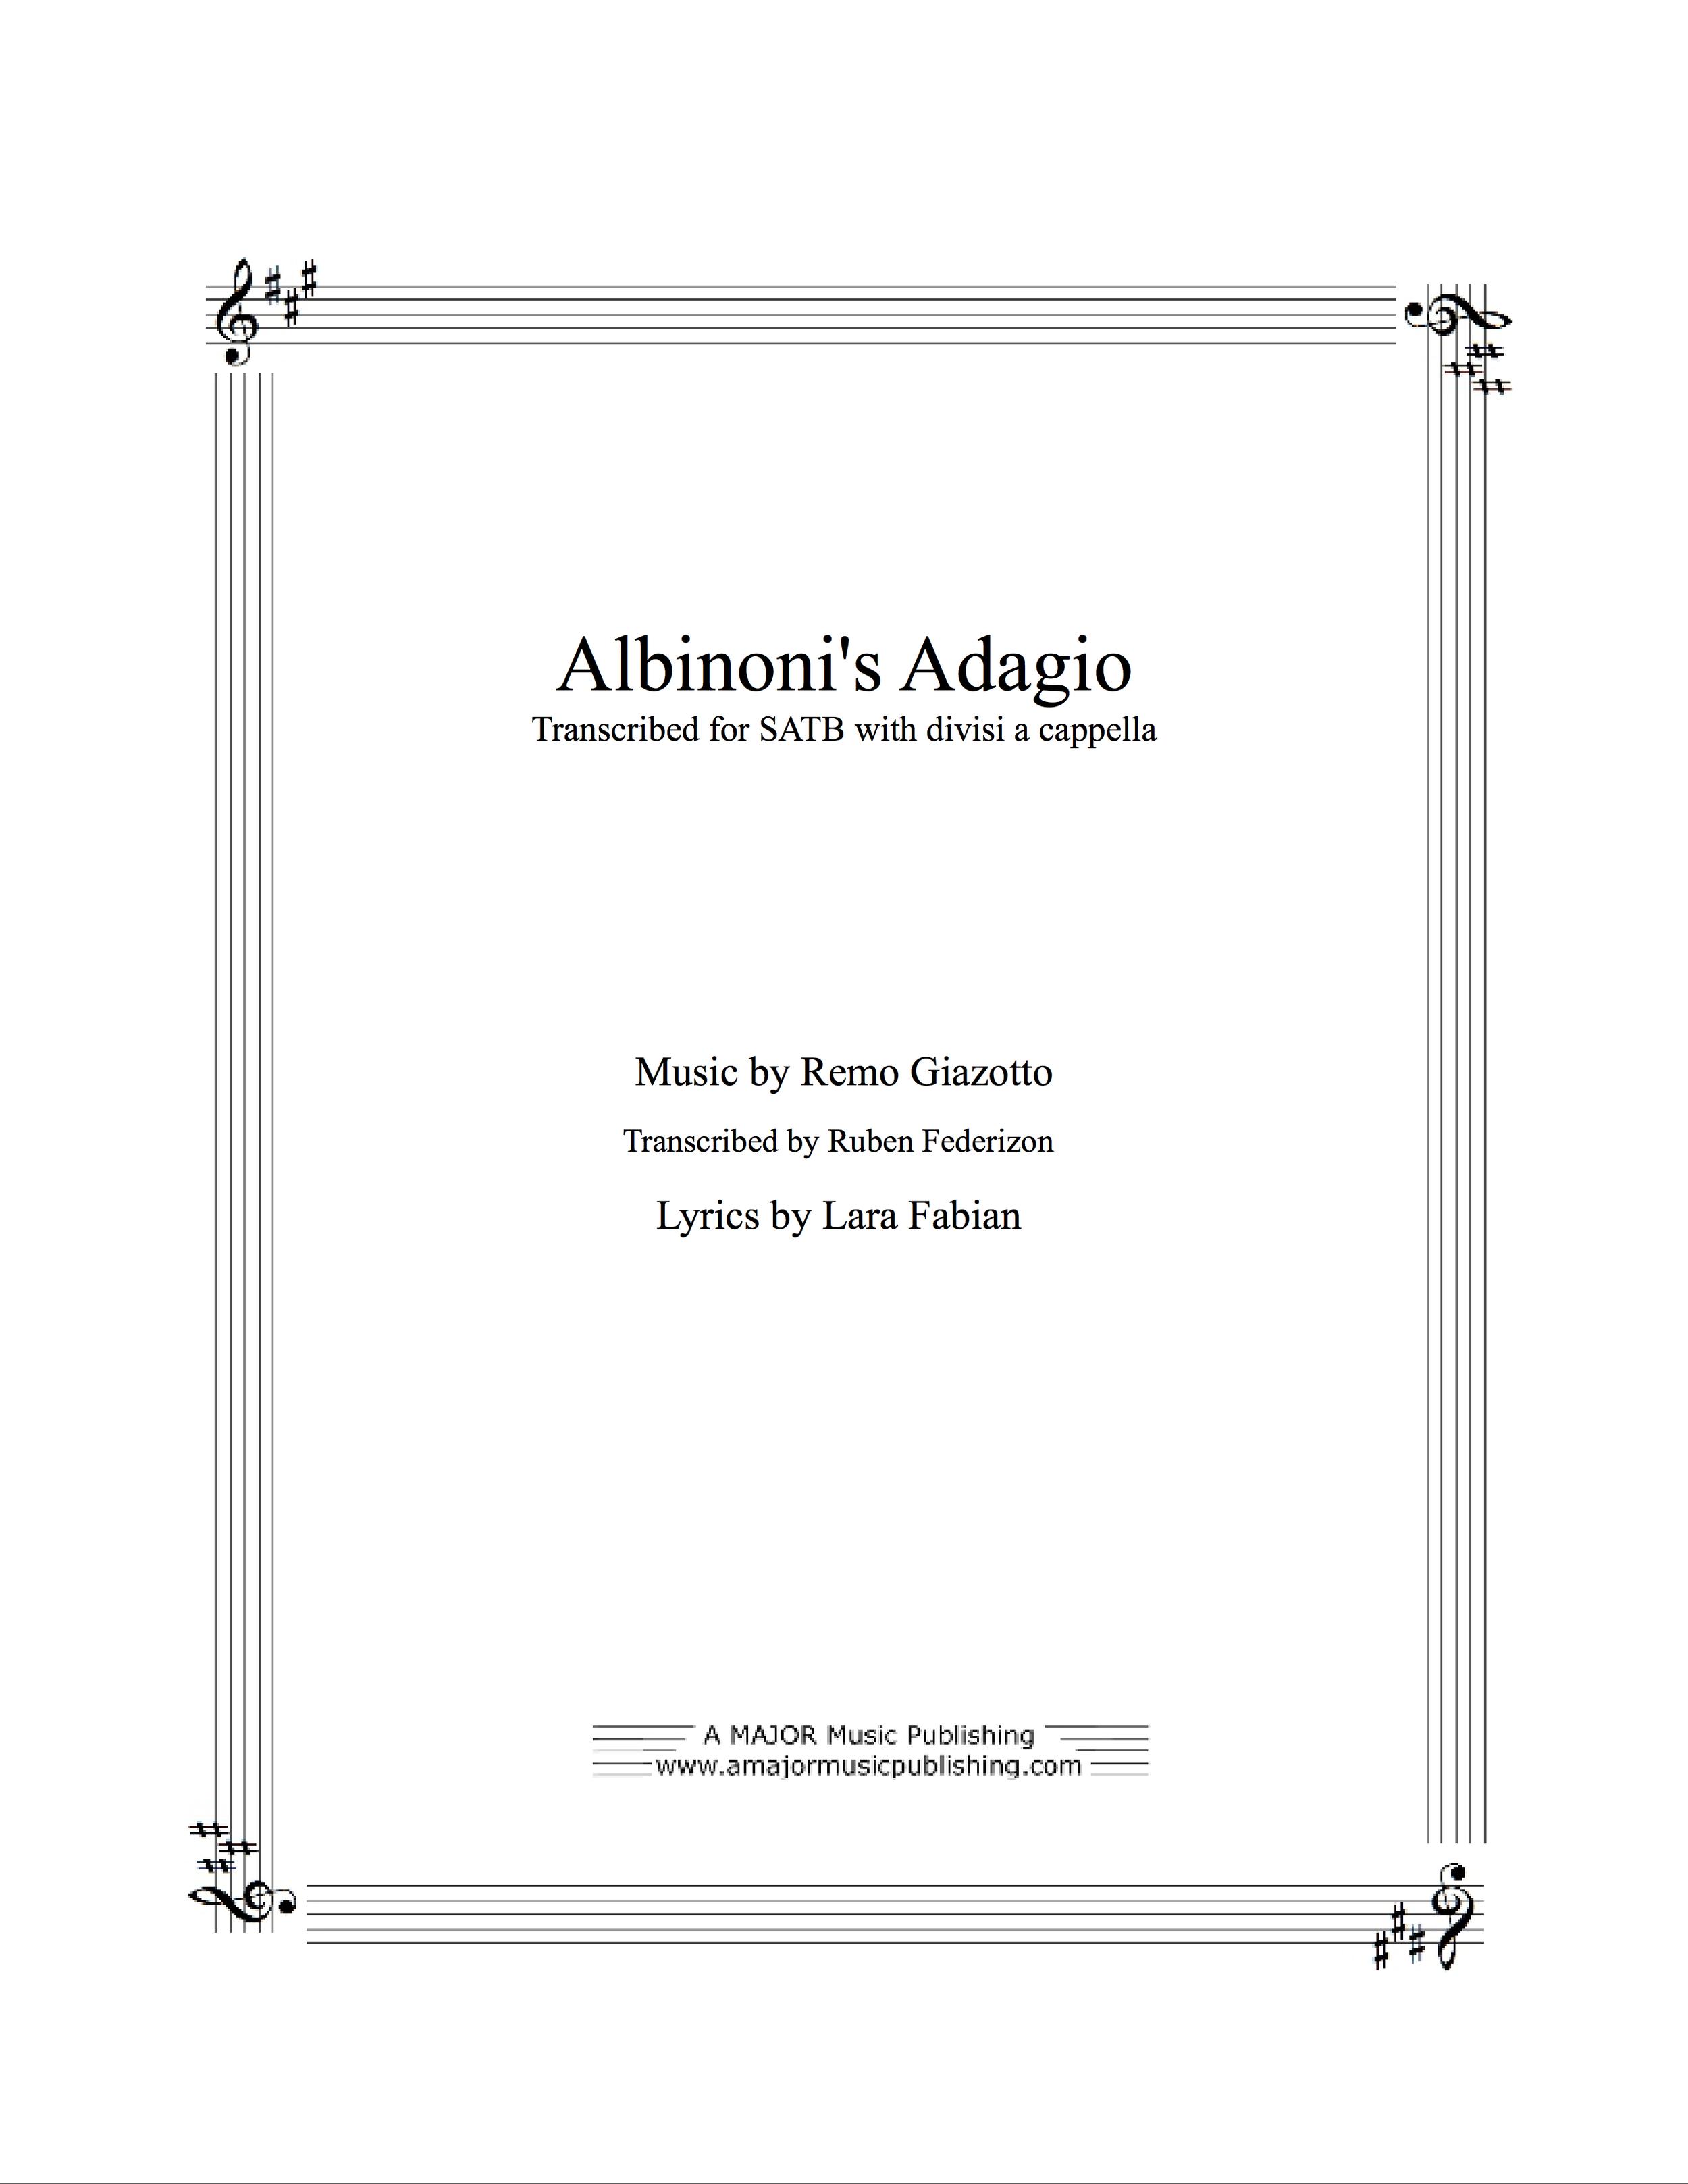 Albinoni's Adagio07_0001.png